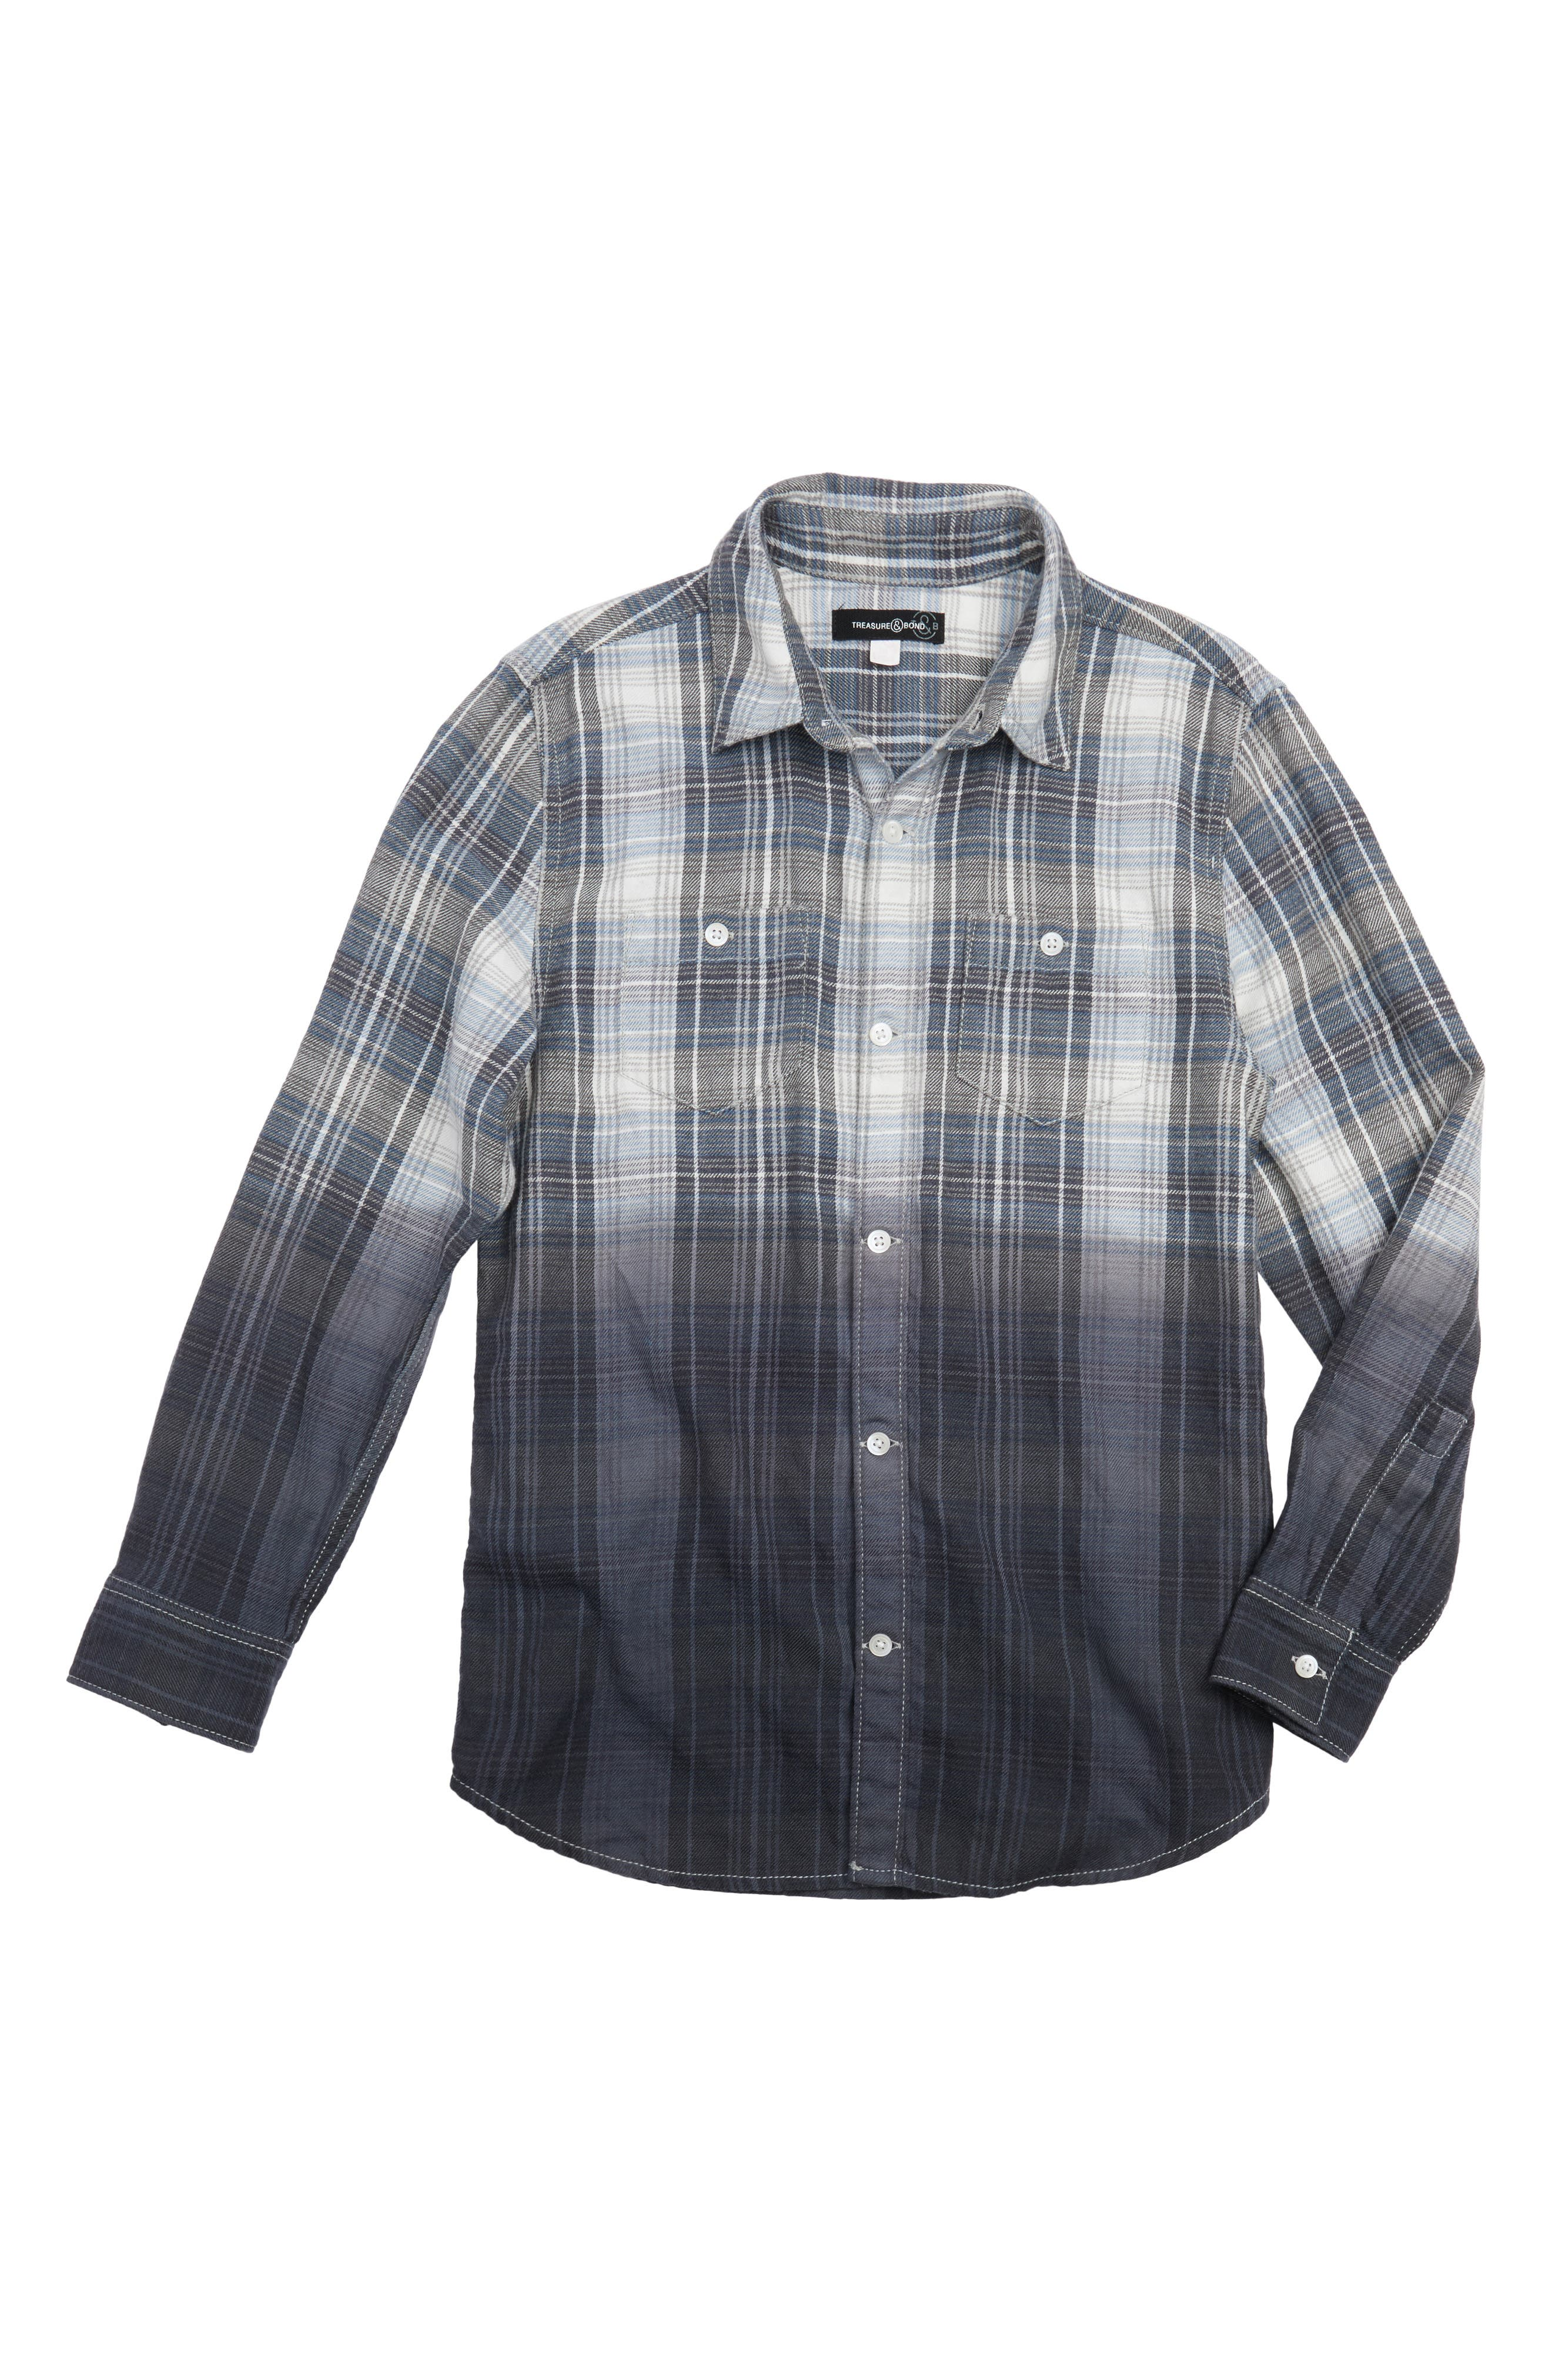 Main Image - Treasure & Bond Ombré Plaid Shirt (Big Boys)